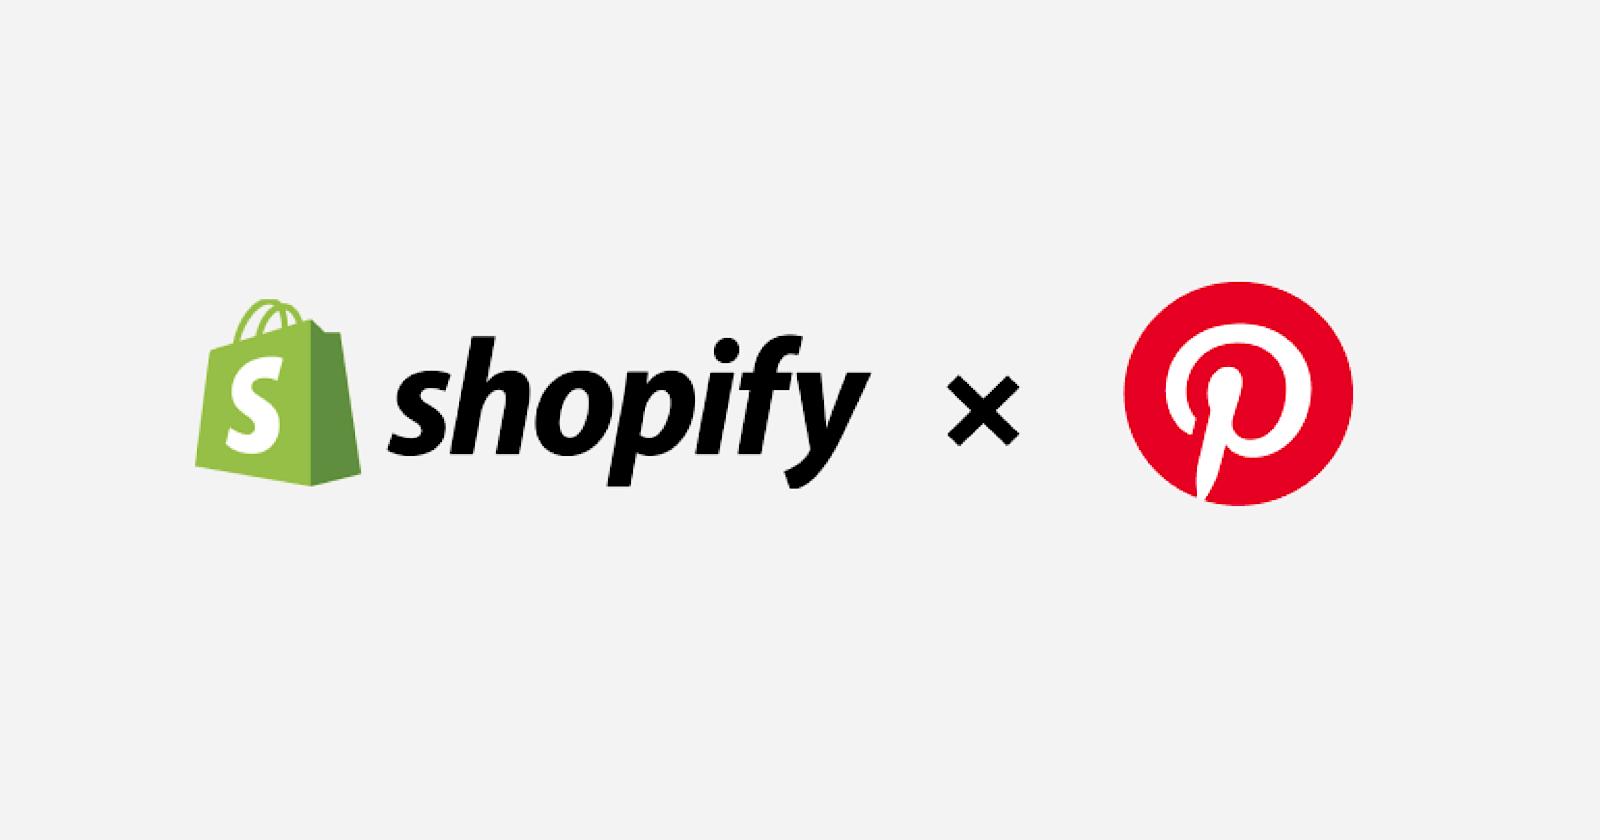 Pinterest Expands Shopify Integration Worldwide via @sejournal, @MattGSouthern